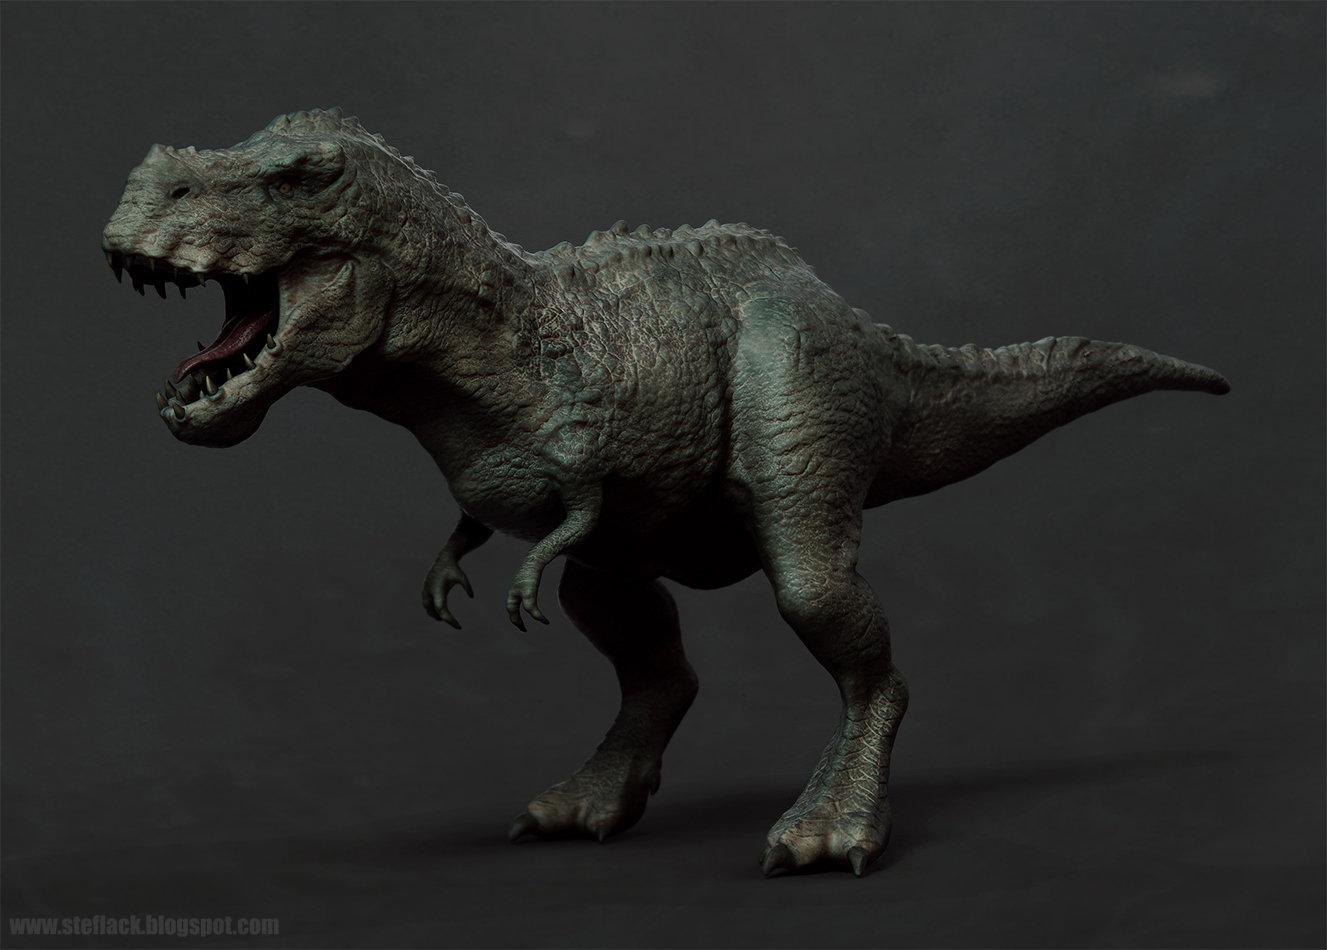 Ste flack v rex02